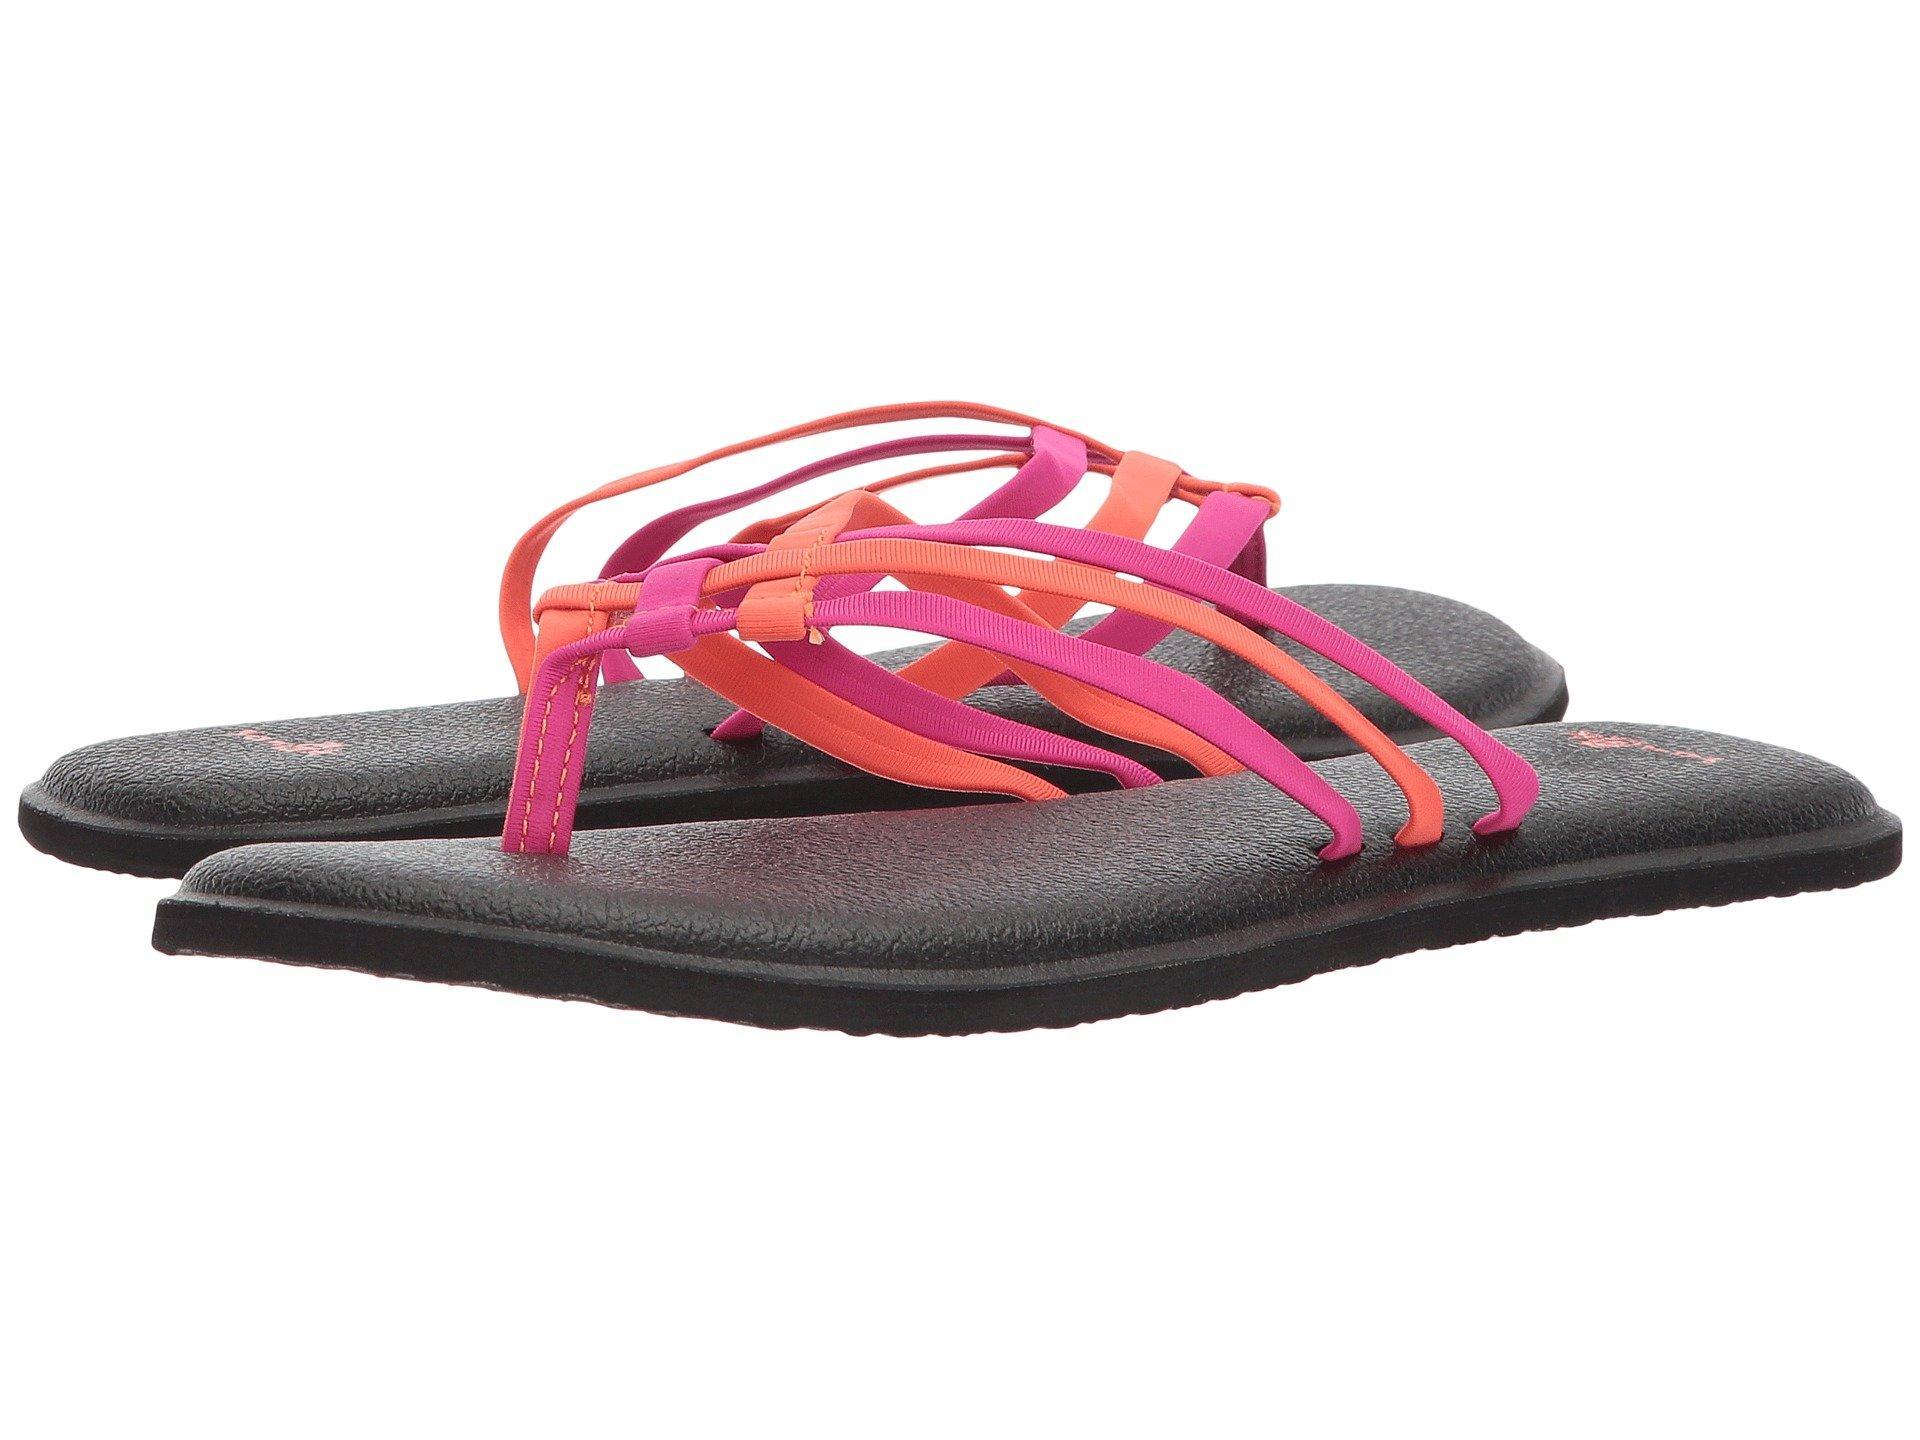 6dd3ca8a4 Lyst - Sanuk Yoga Salty (black 2) Women s Sandals